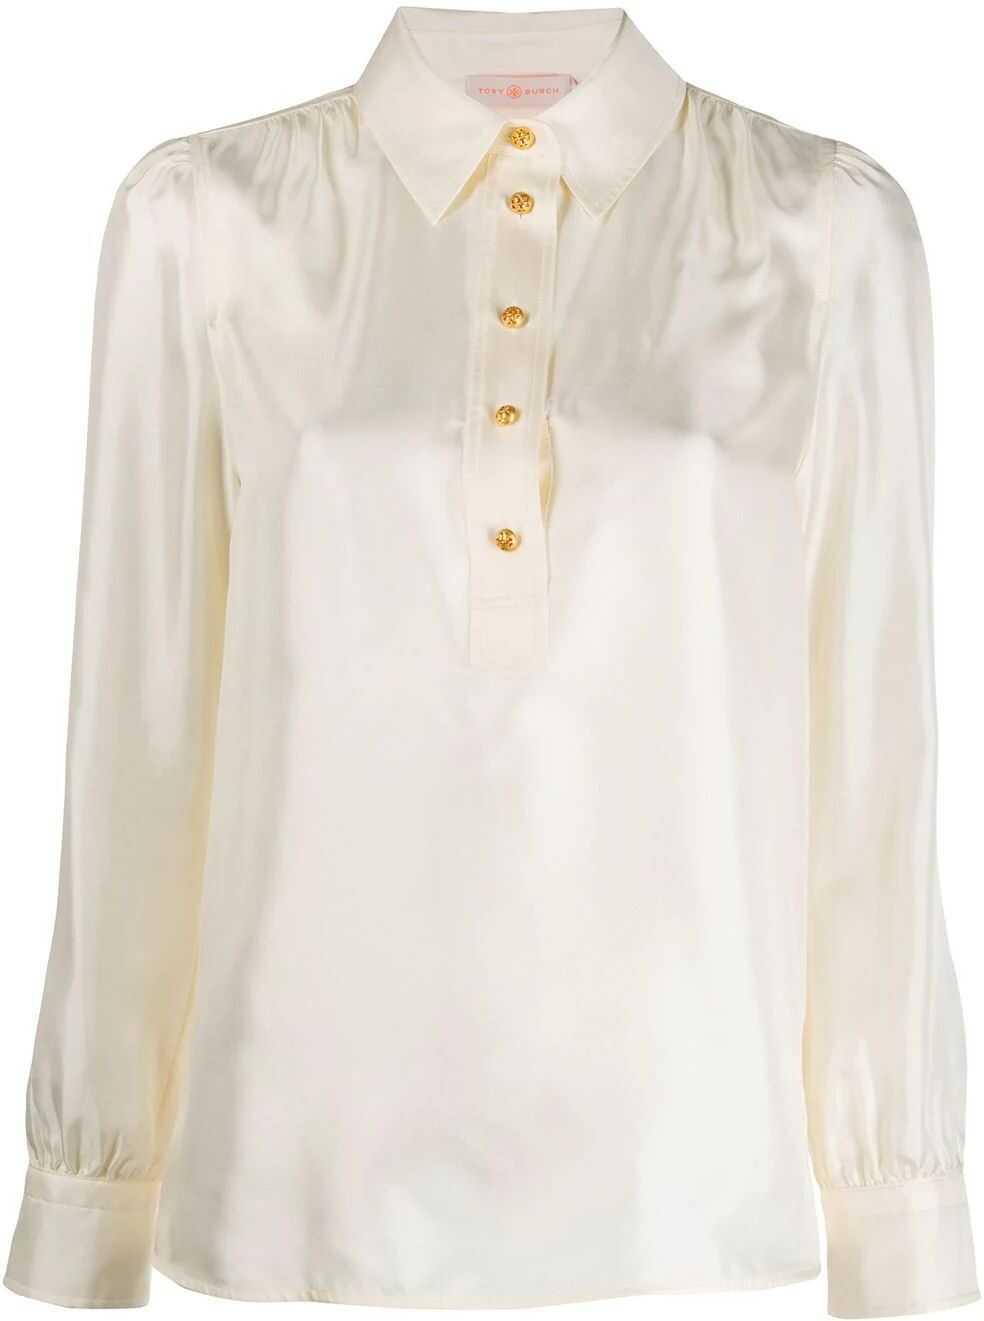 Tory Burch Silk Blouse WHITE